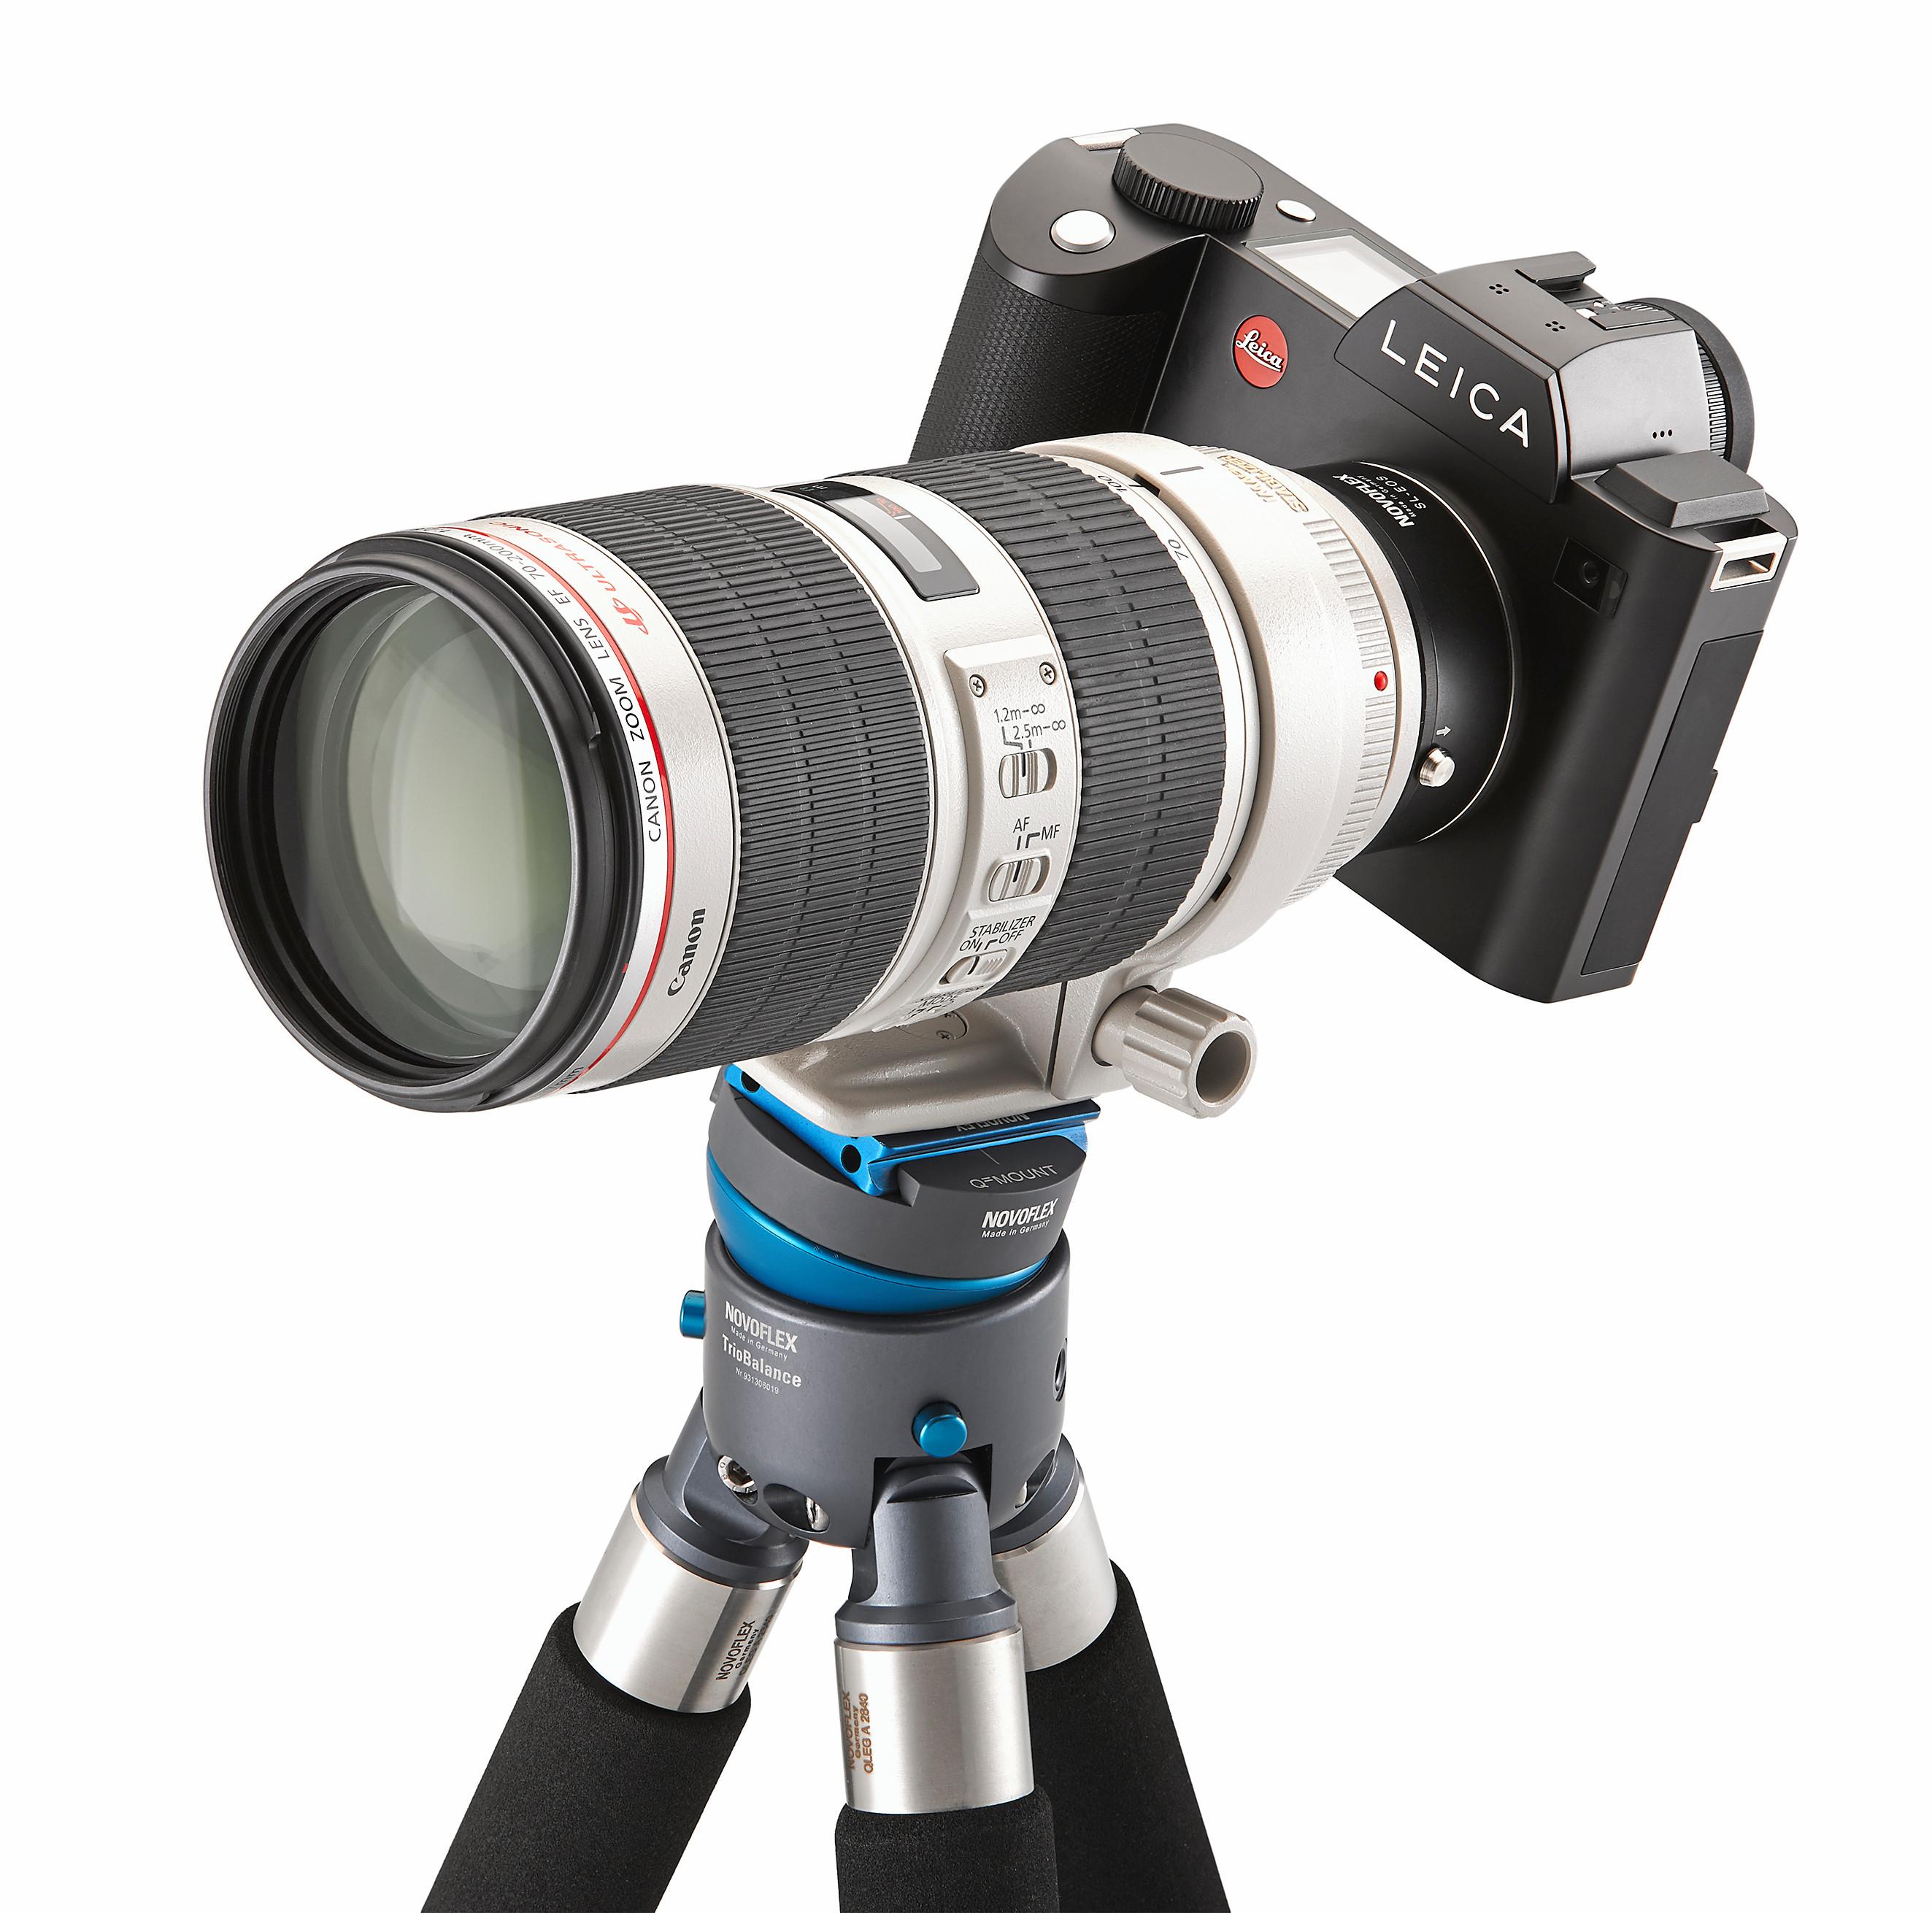 Novoflex releases Canon EF electronic adapter for Leica SL